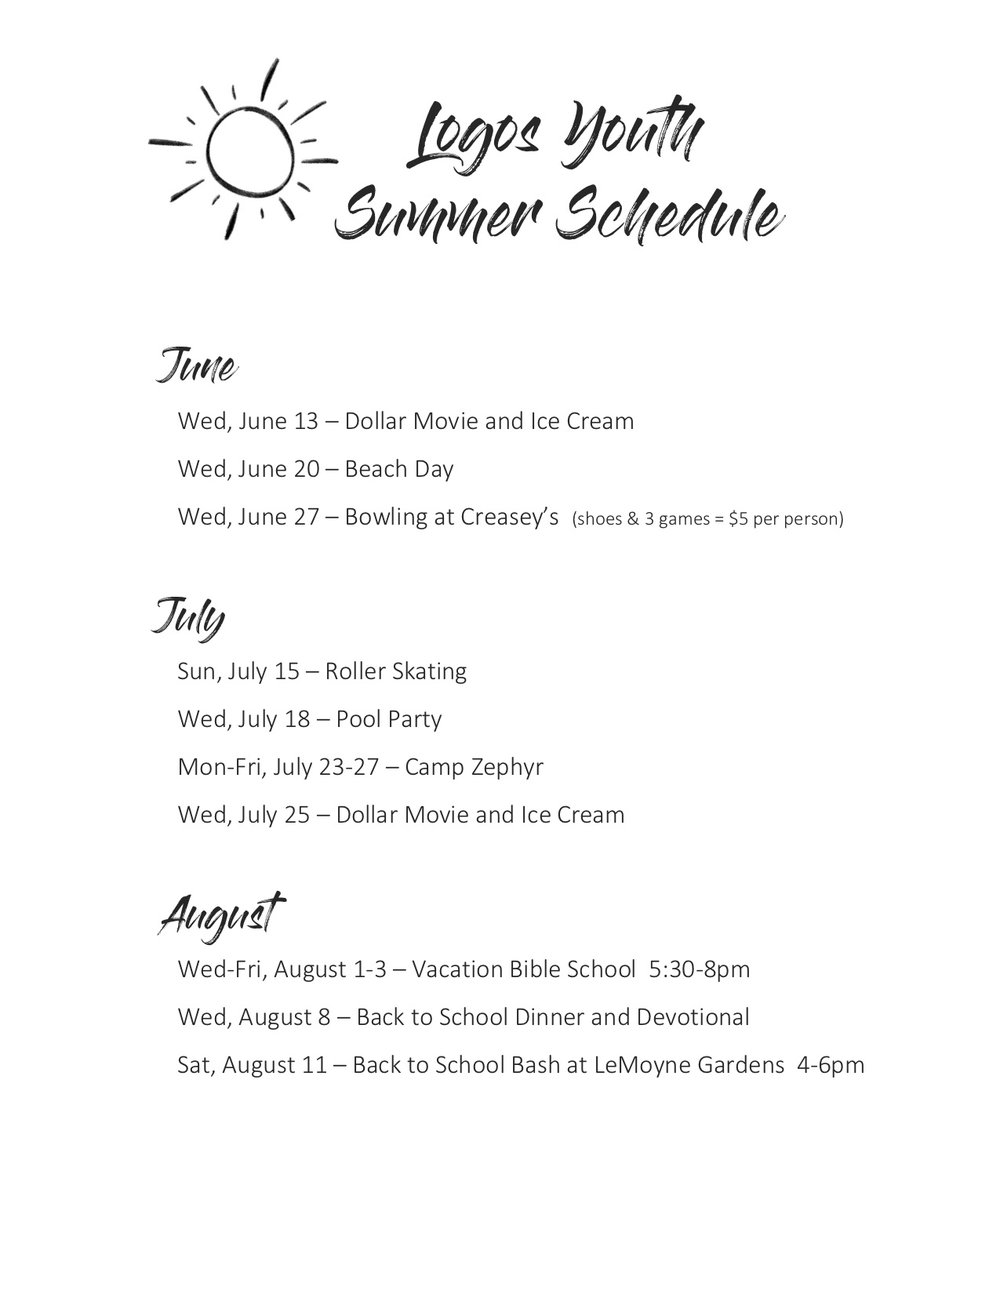 Logos Youth Summer Schedule.jpg